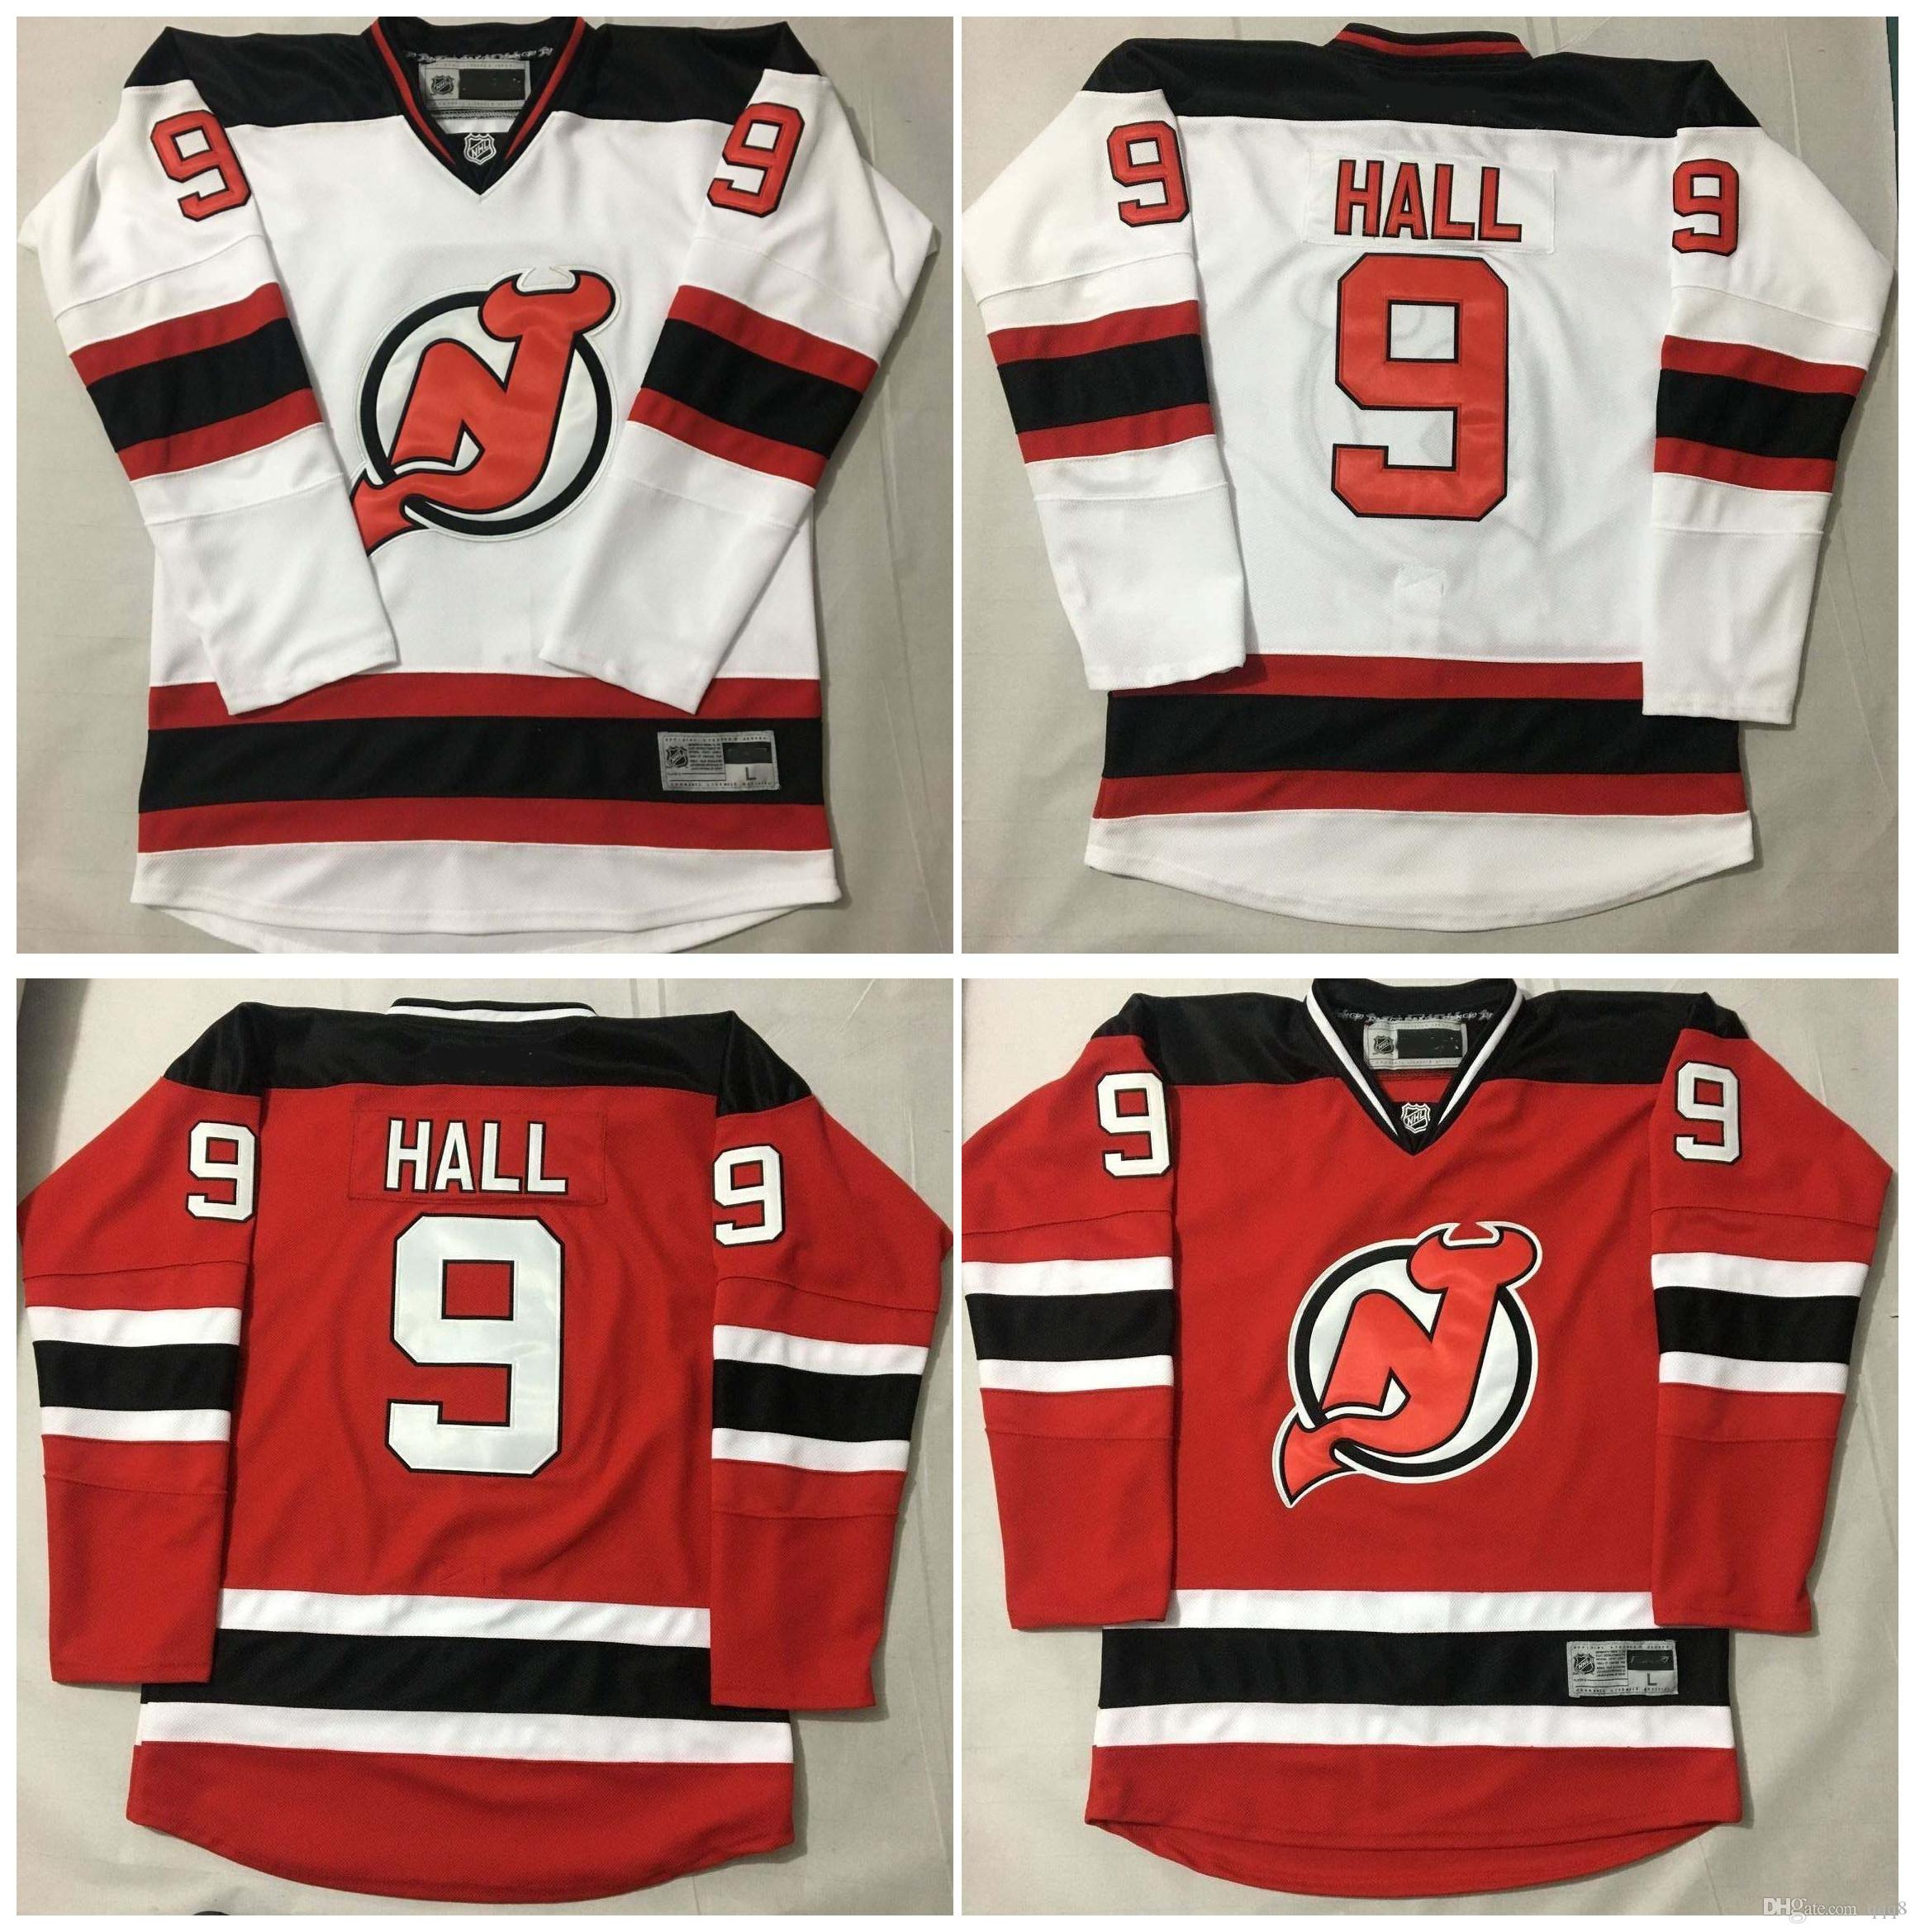 Qualidade máxima ! 2016 Homens New Jersey Devils Camisolas De Hóquei Barato # 9 Taylor Hall Jersey Branco Vermelho Autêntico Costurado Jerseys Ordem Mix!